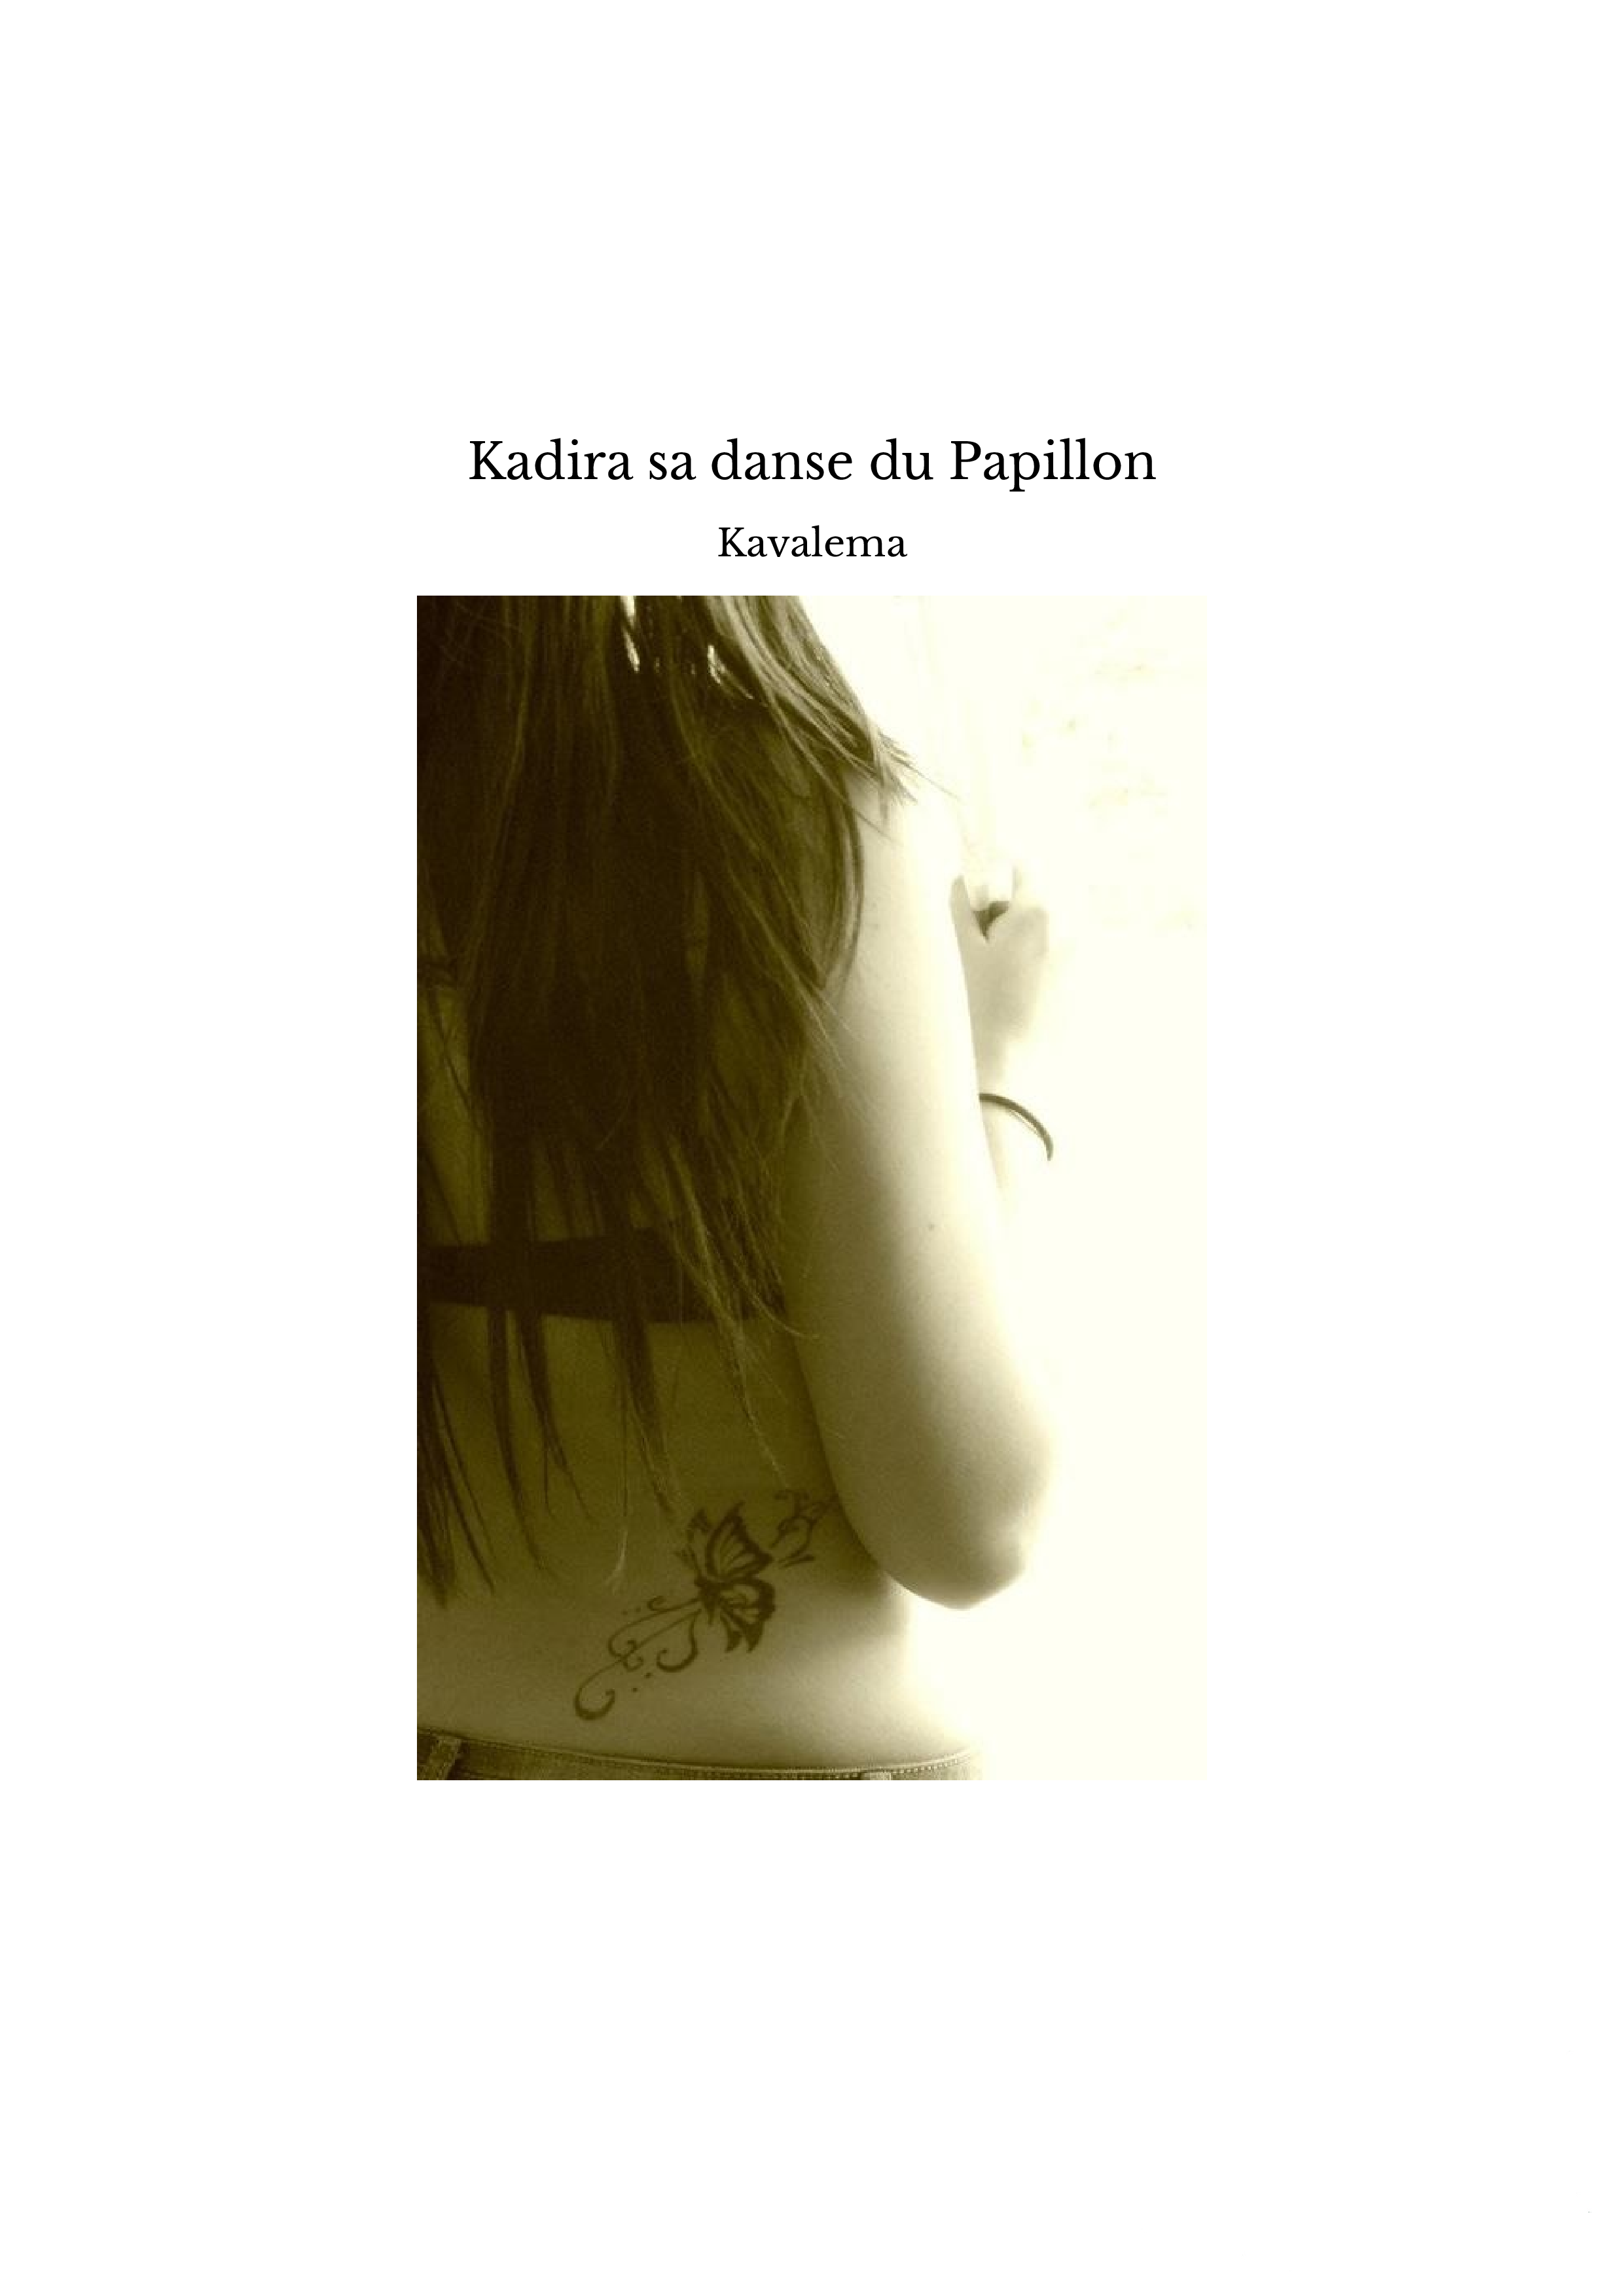 Kadira sa danse du Papillon